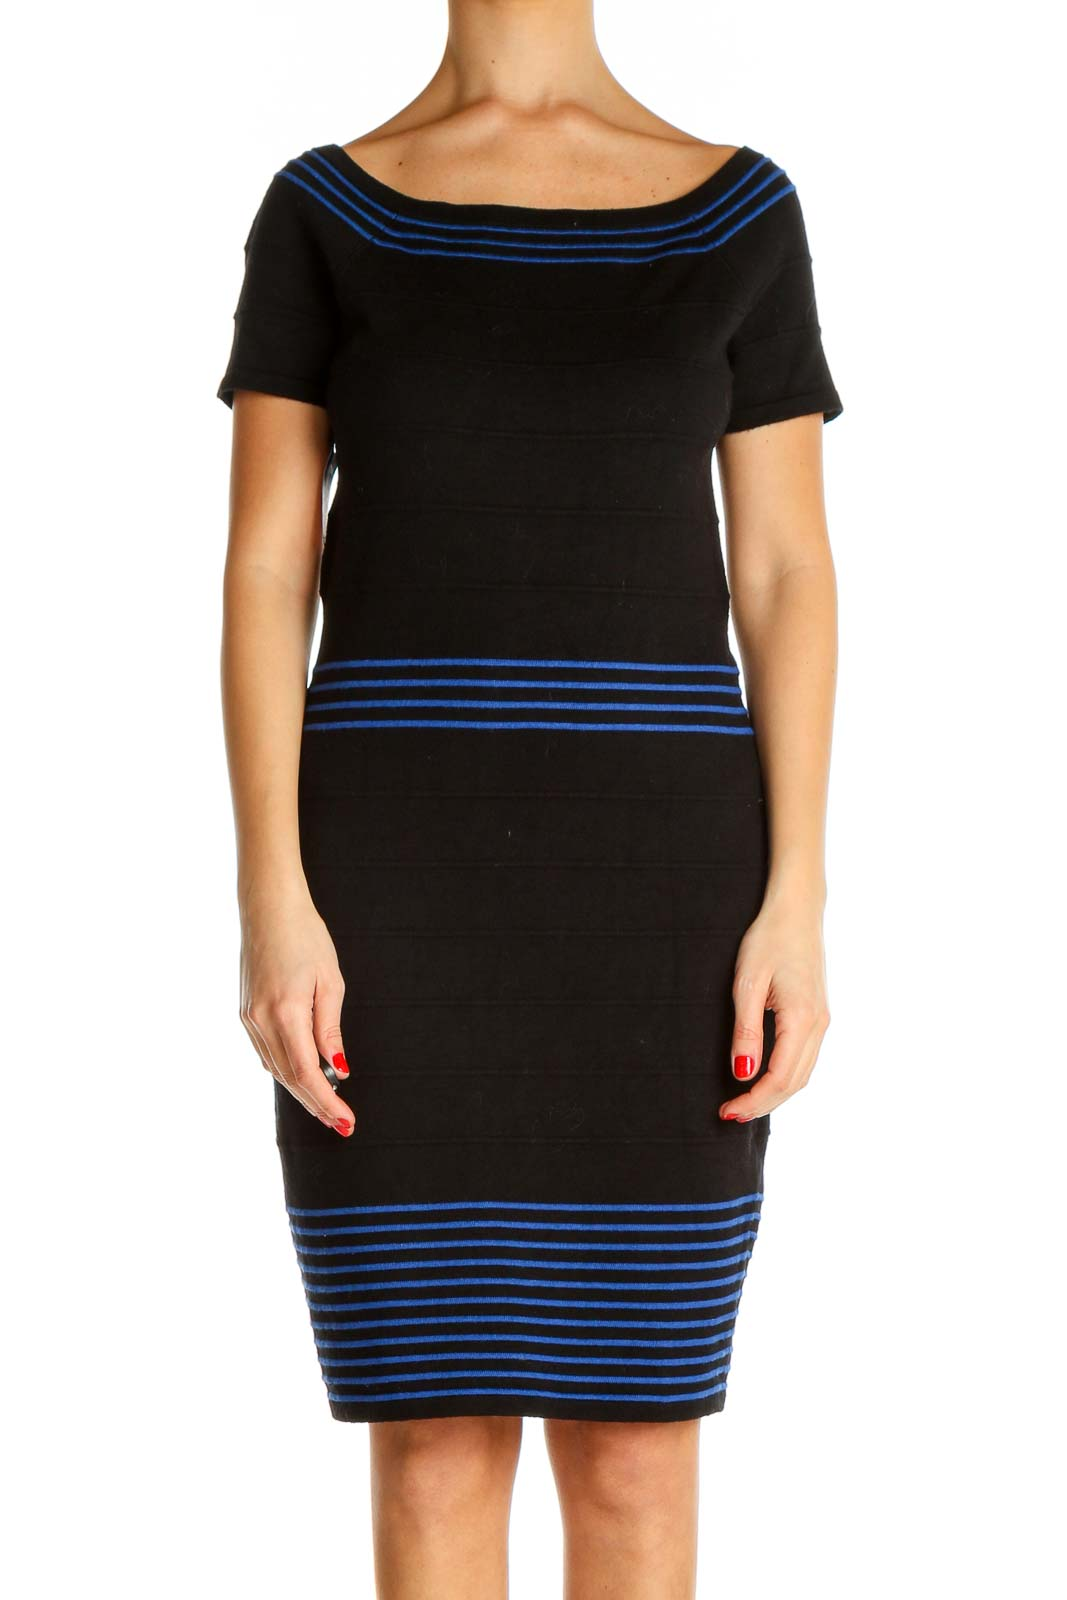 Black Striped Classic Sheath Dress Front